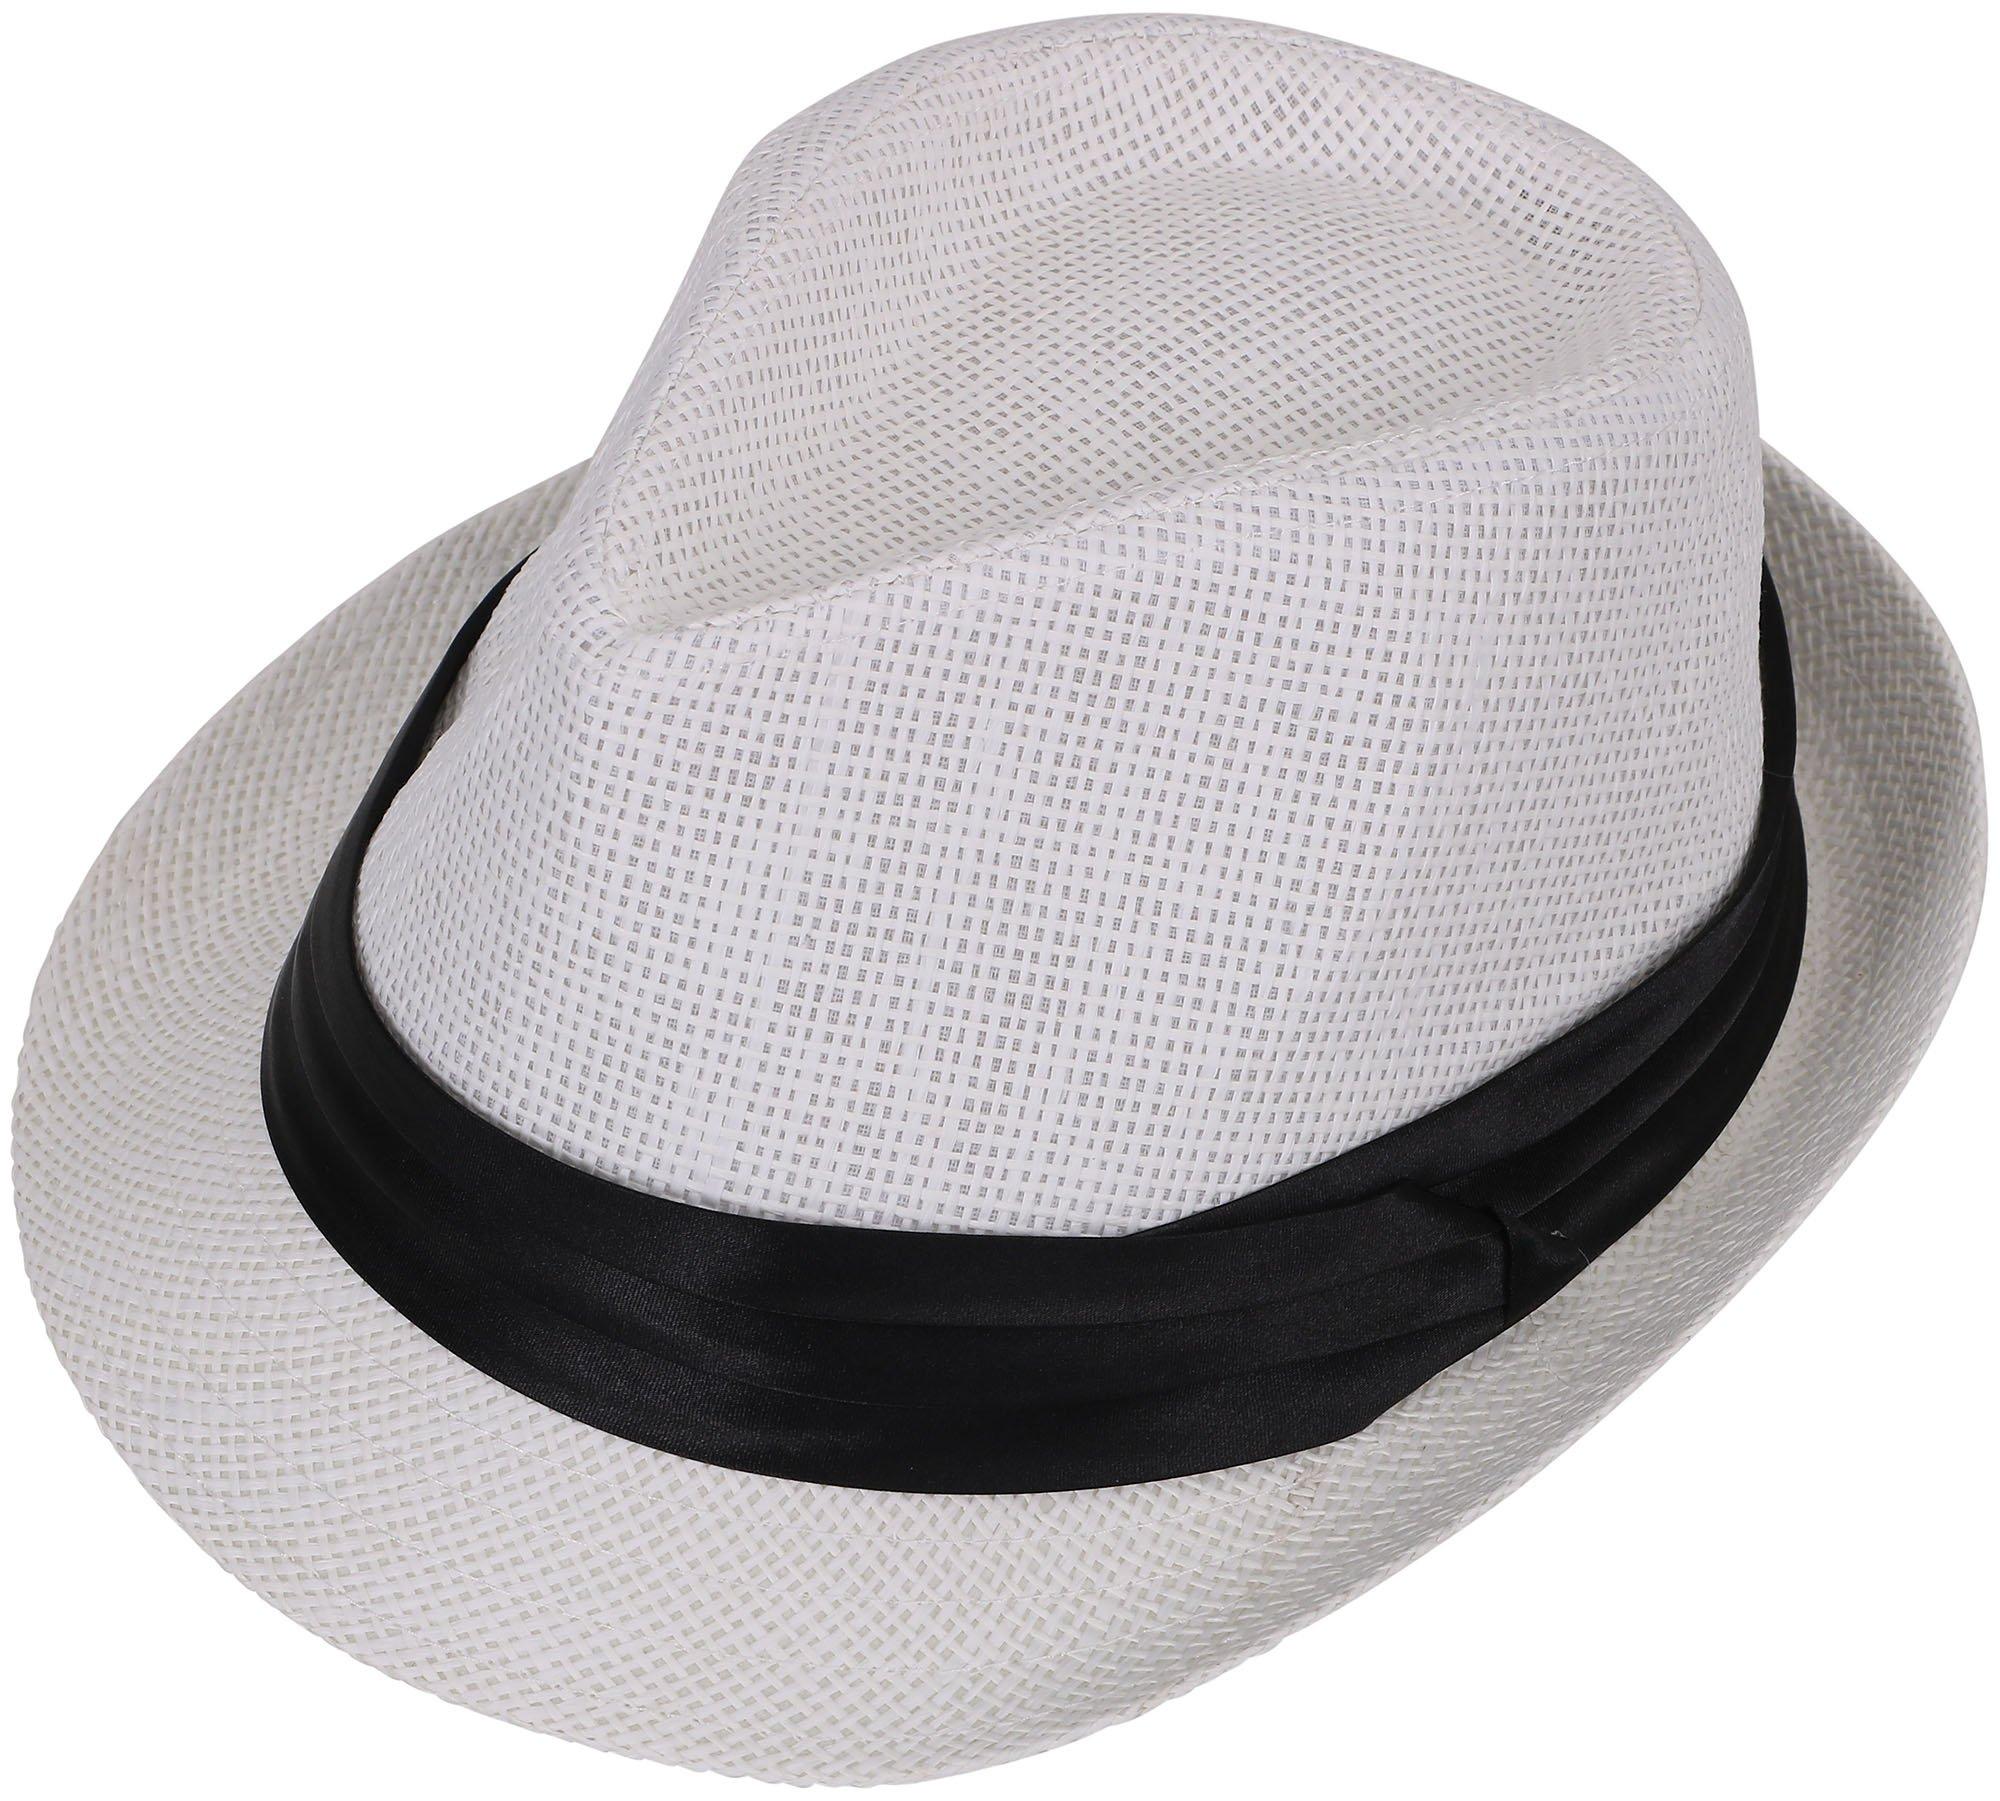 Simplicity Woven Trilby Short Brim Straw Fedora Hat White L/XL